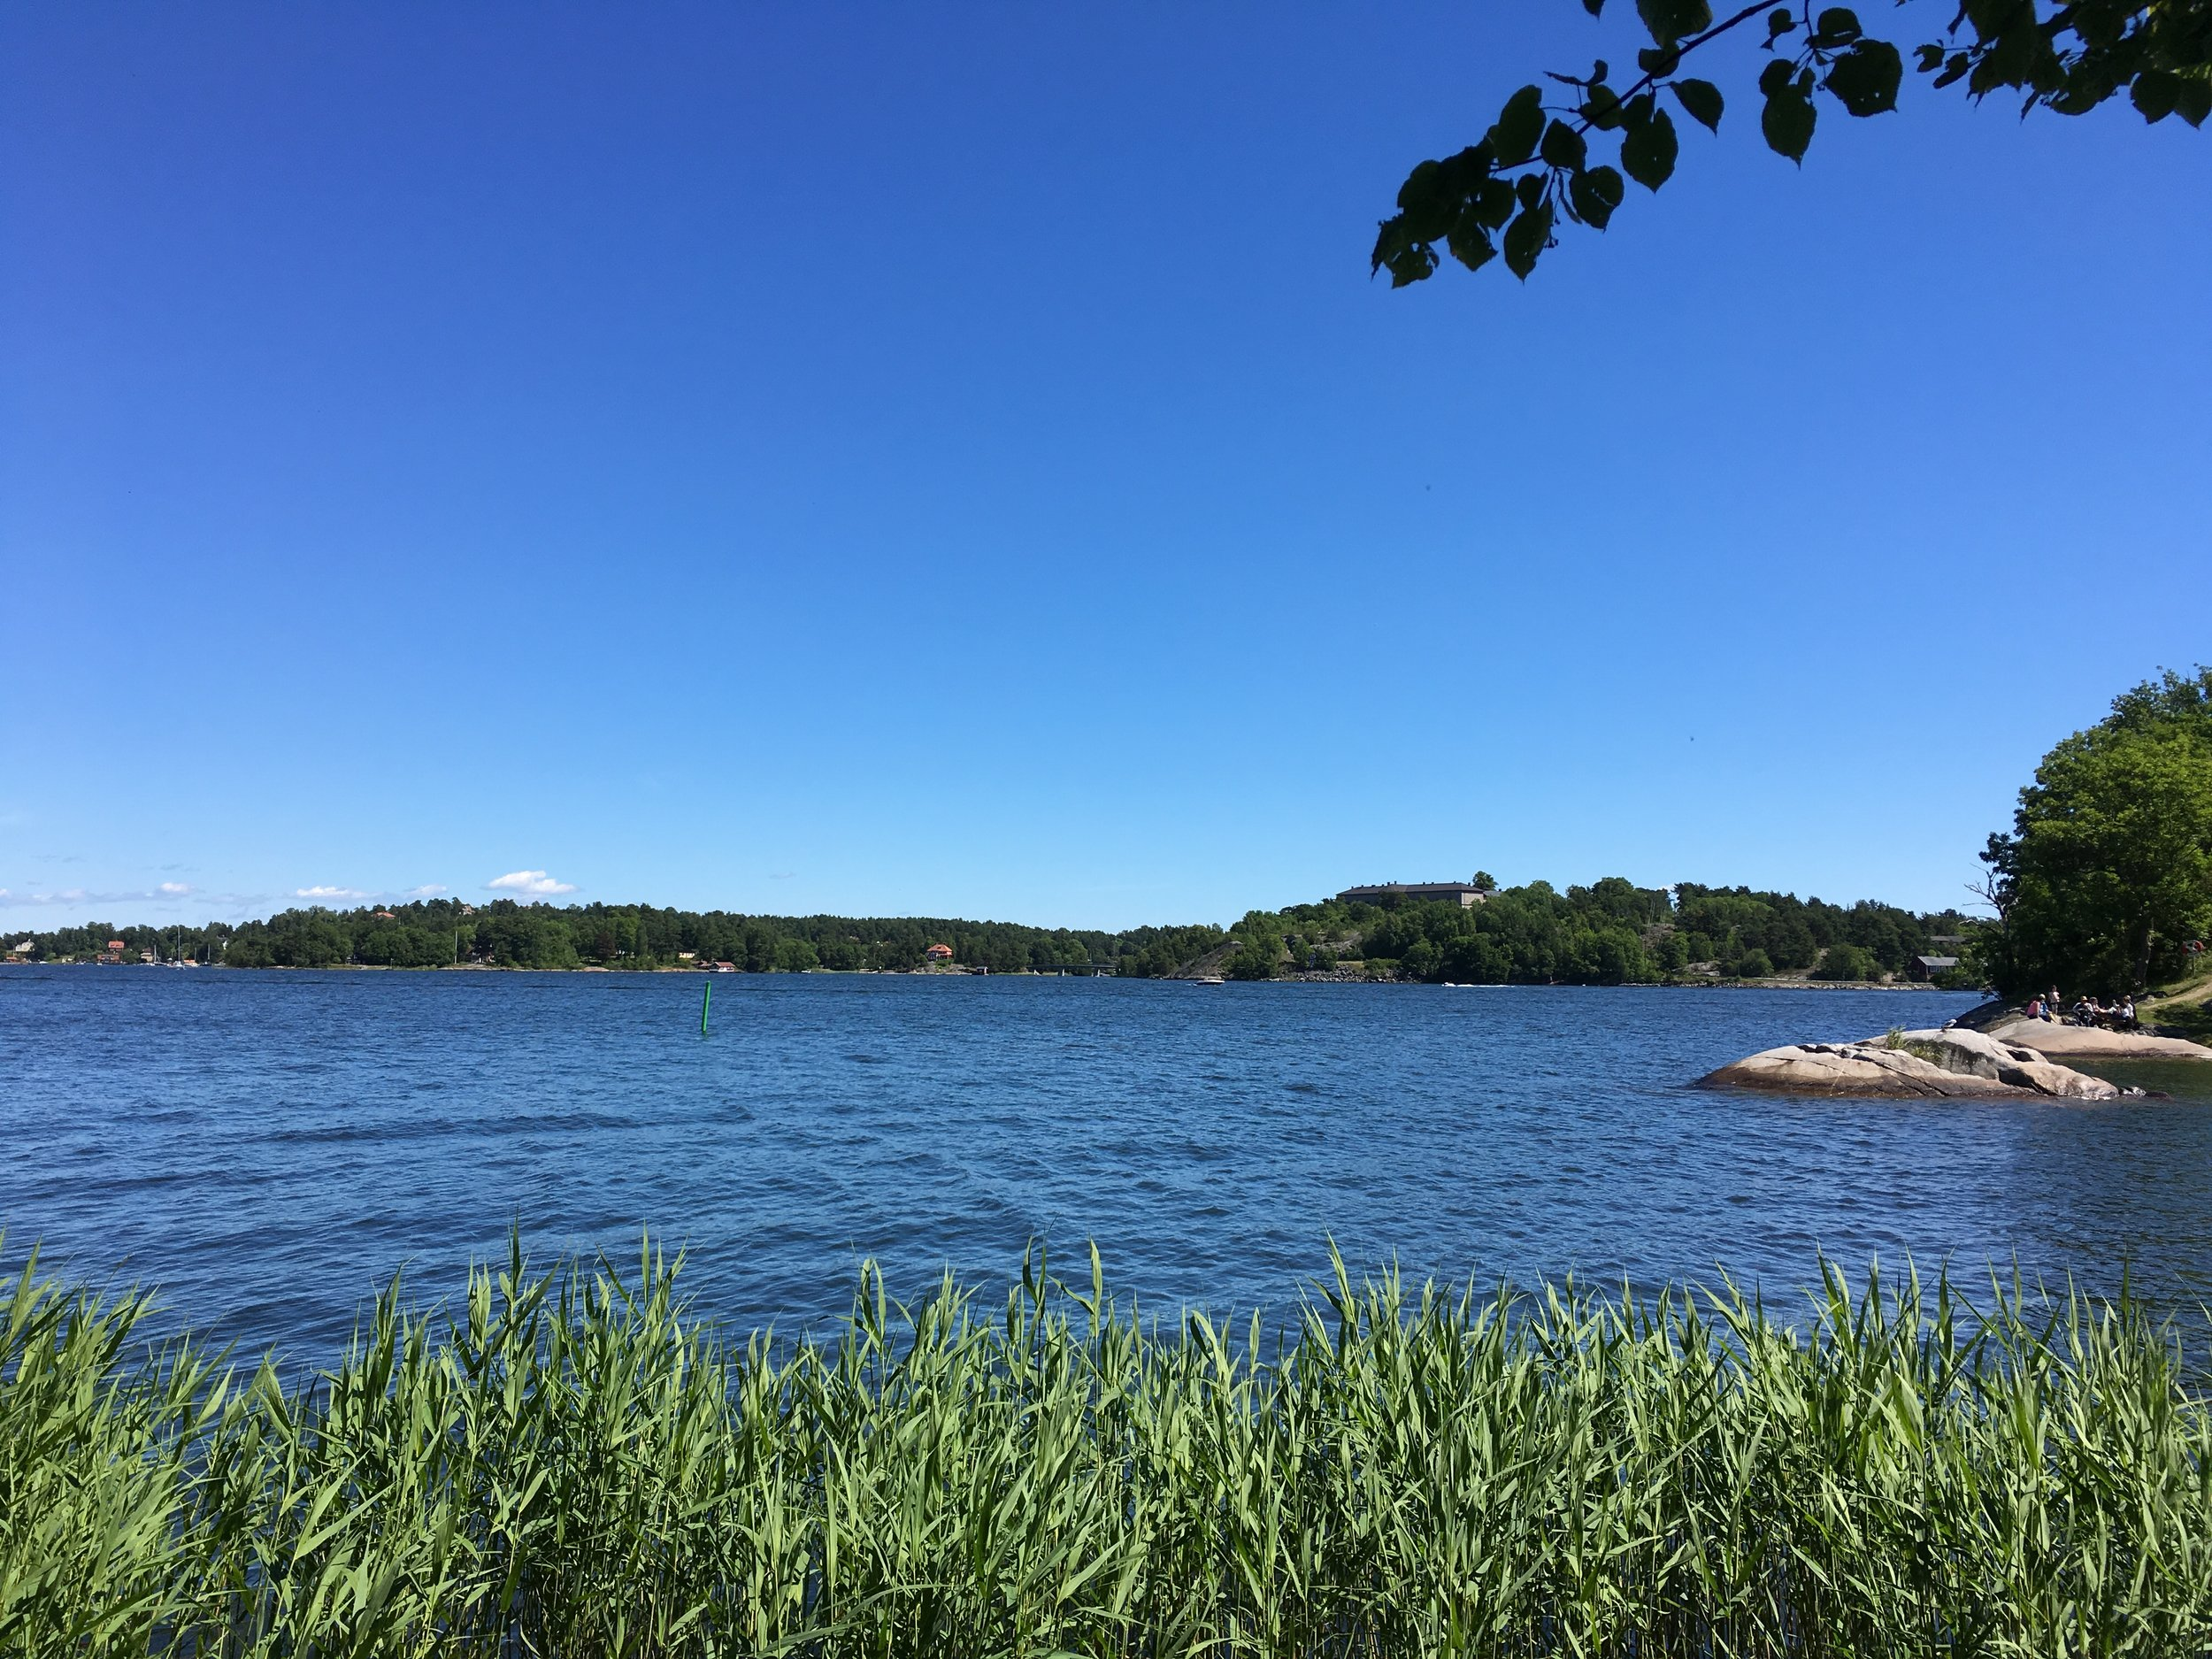 Dejta mn i Vaxholm Sk bland tusentals mn i Vaxholm